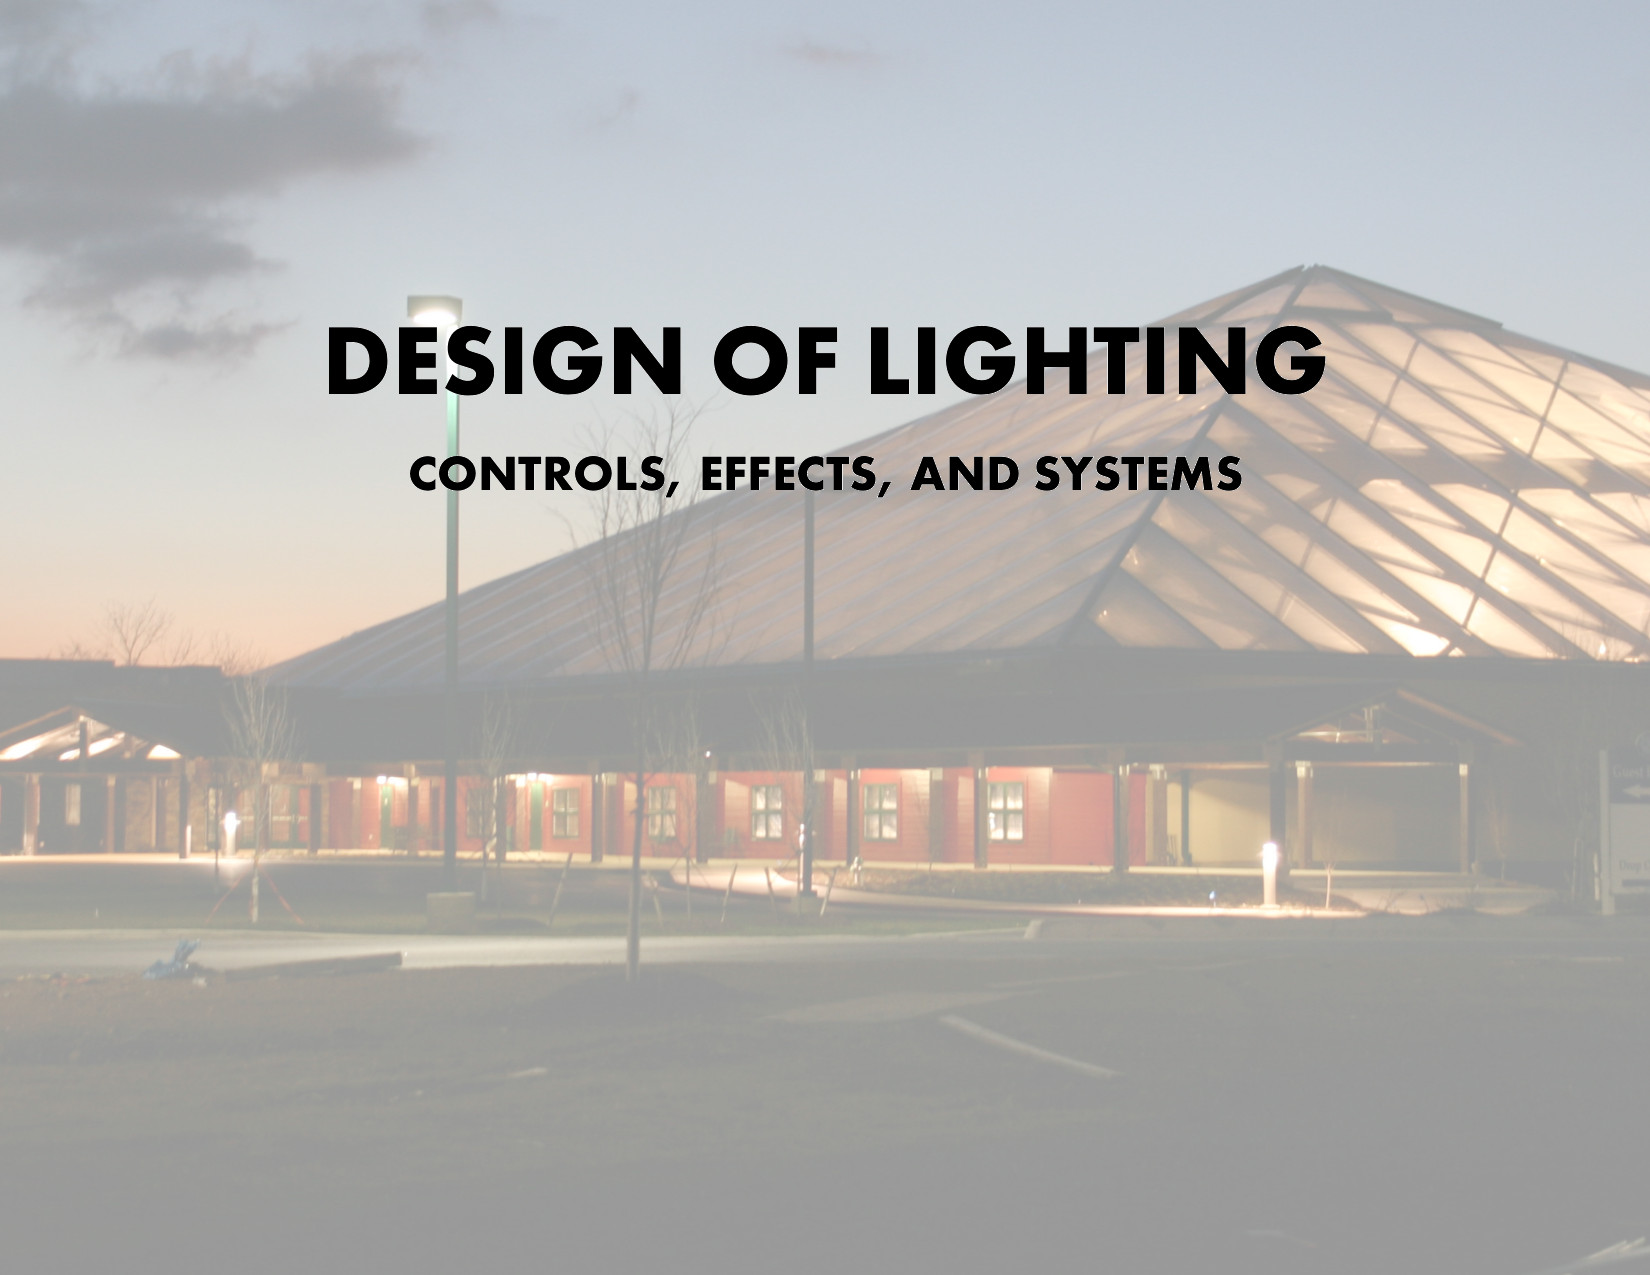 Design of Lighting Controls